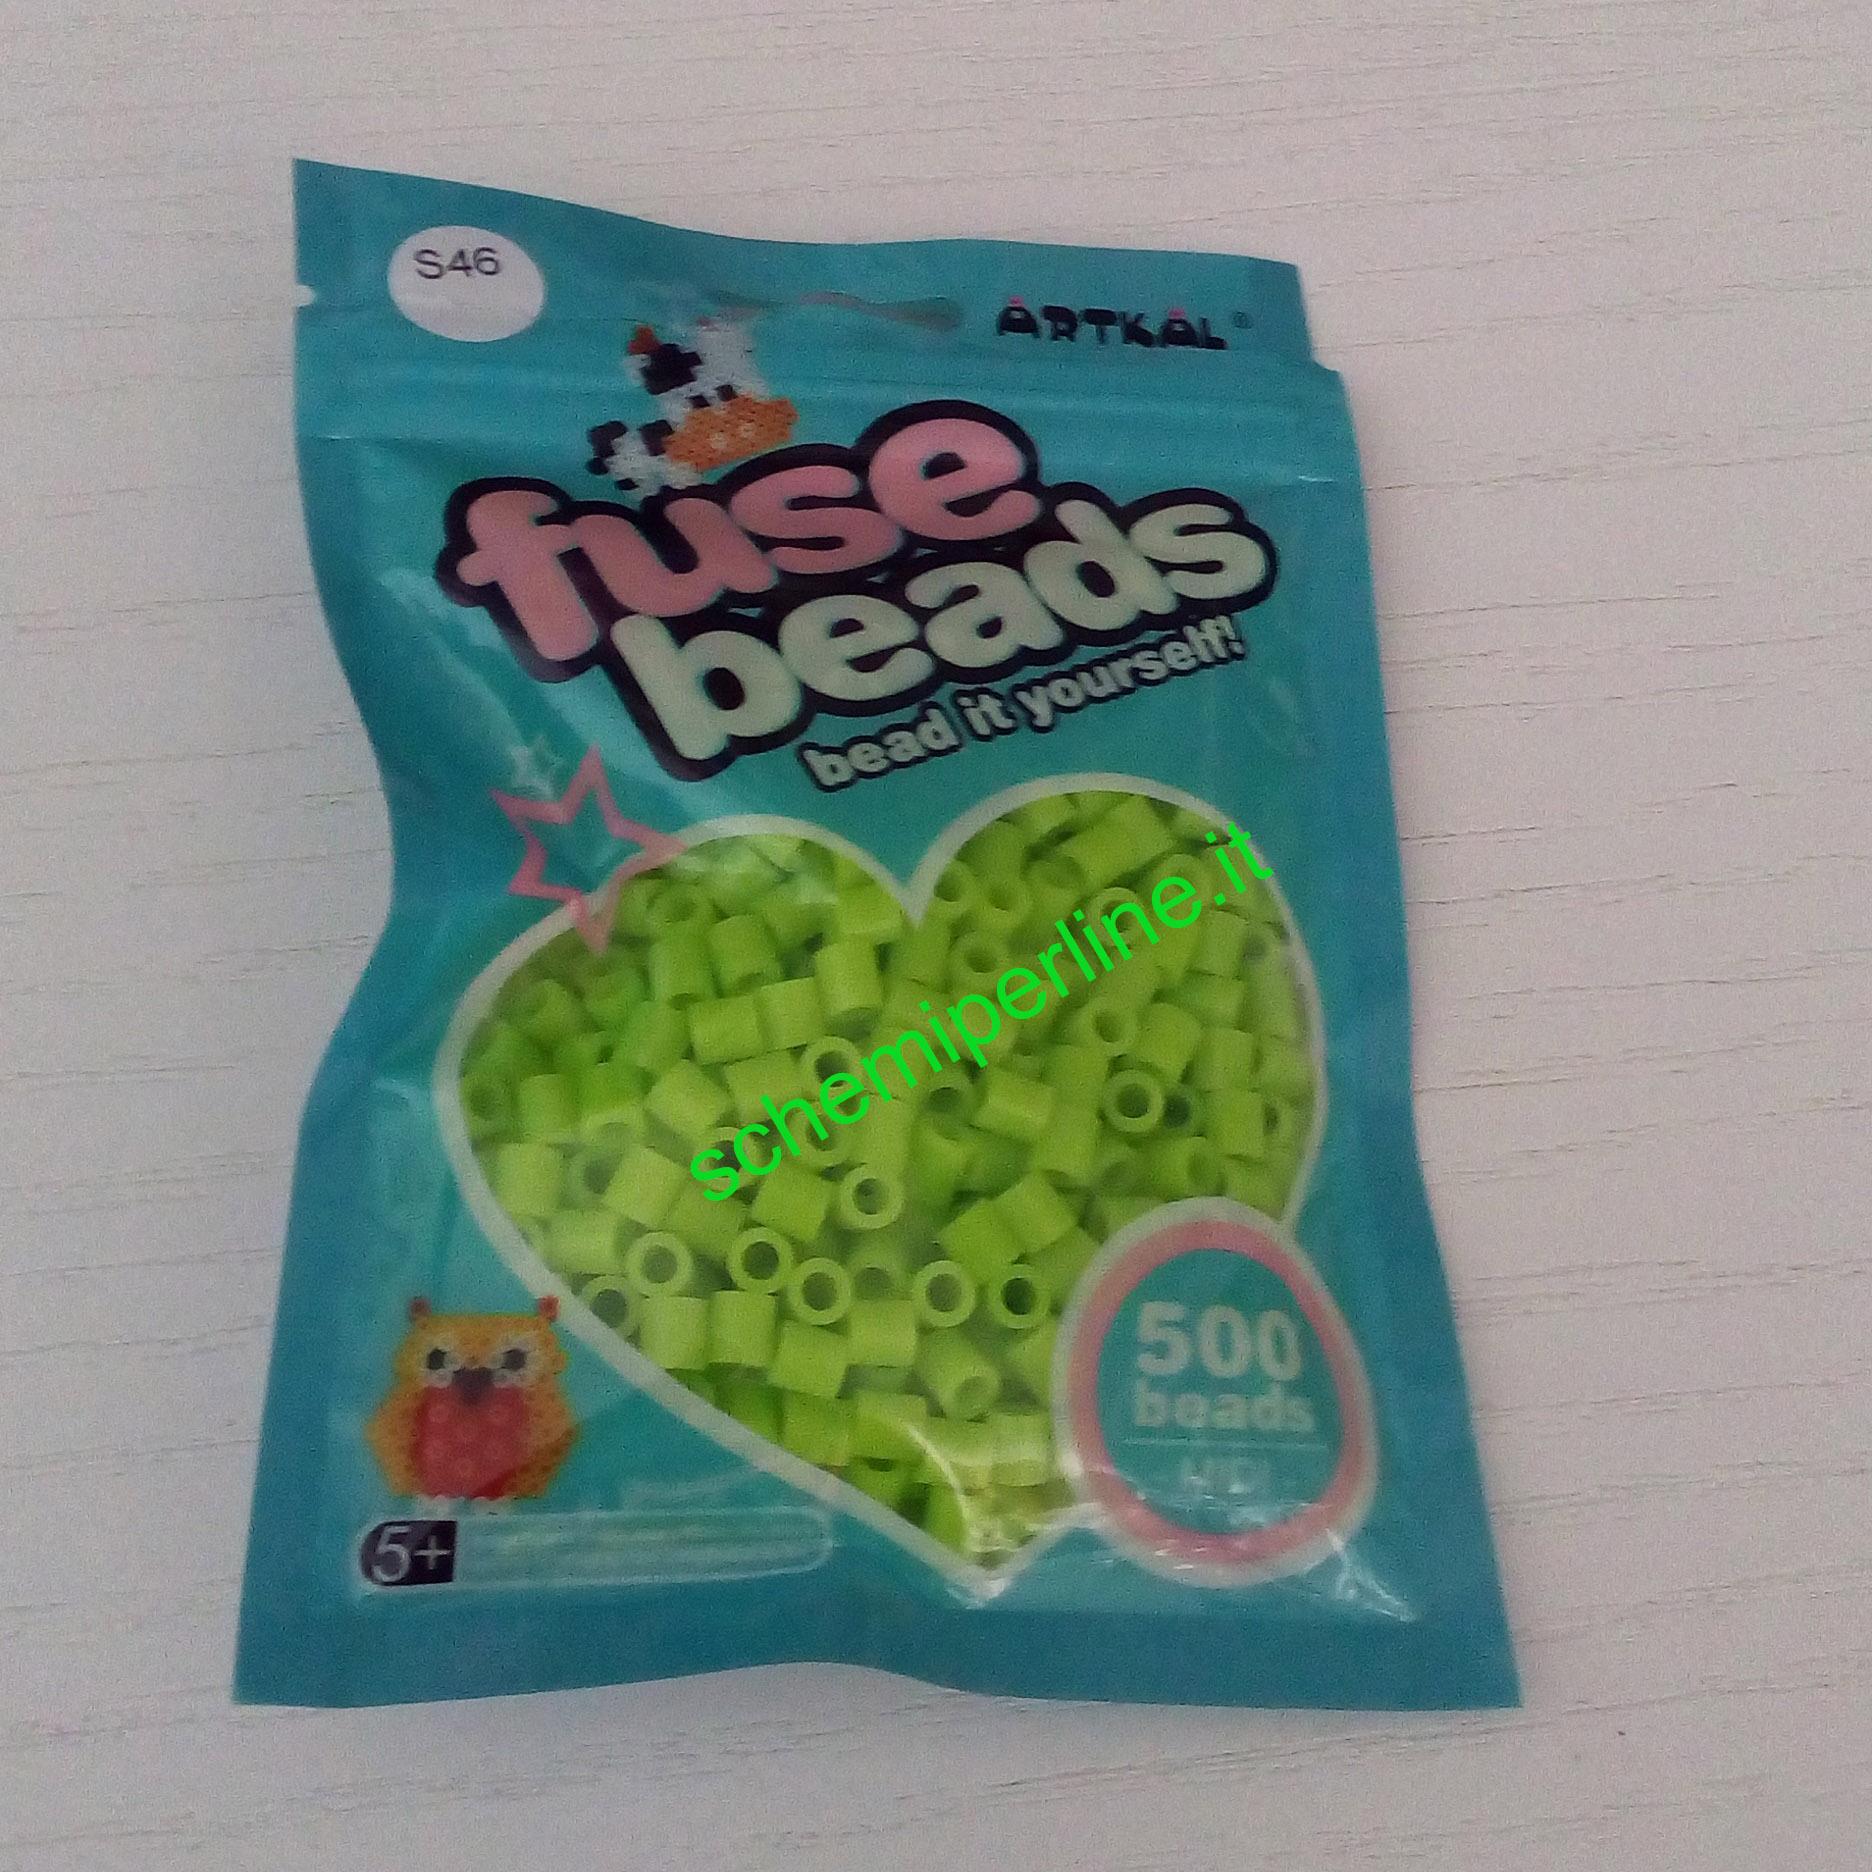 Arkal fuse beads perline da stirare dure midi verde 500